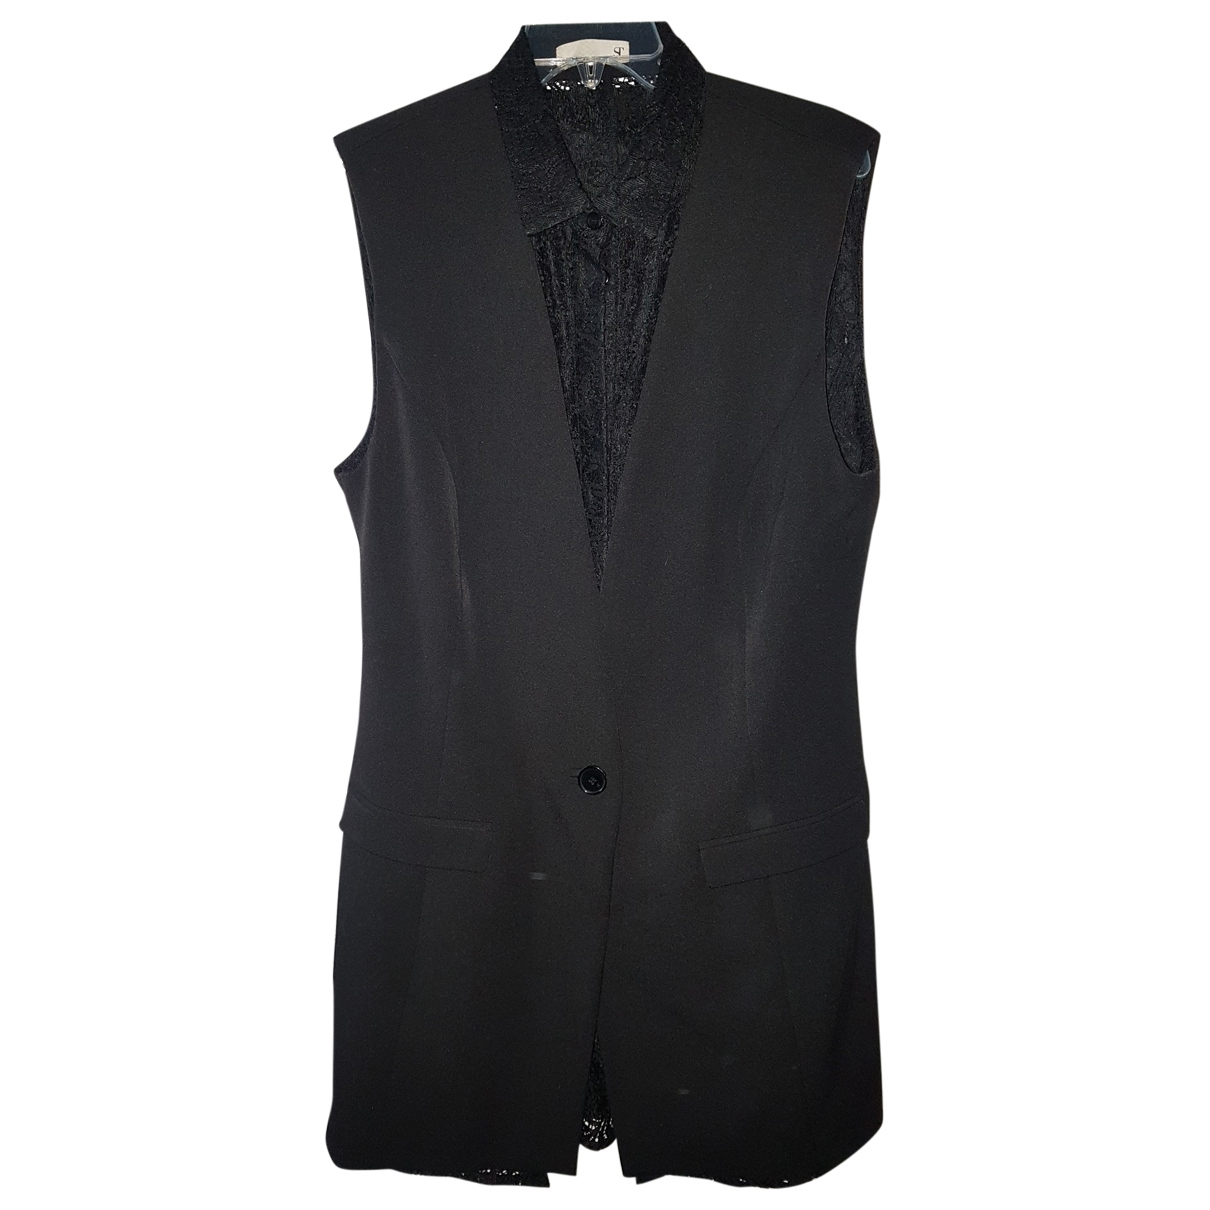 Supertrash \N Black Cotton dress for Women S International